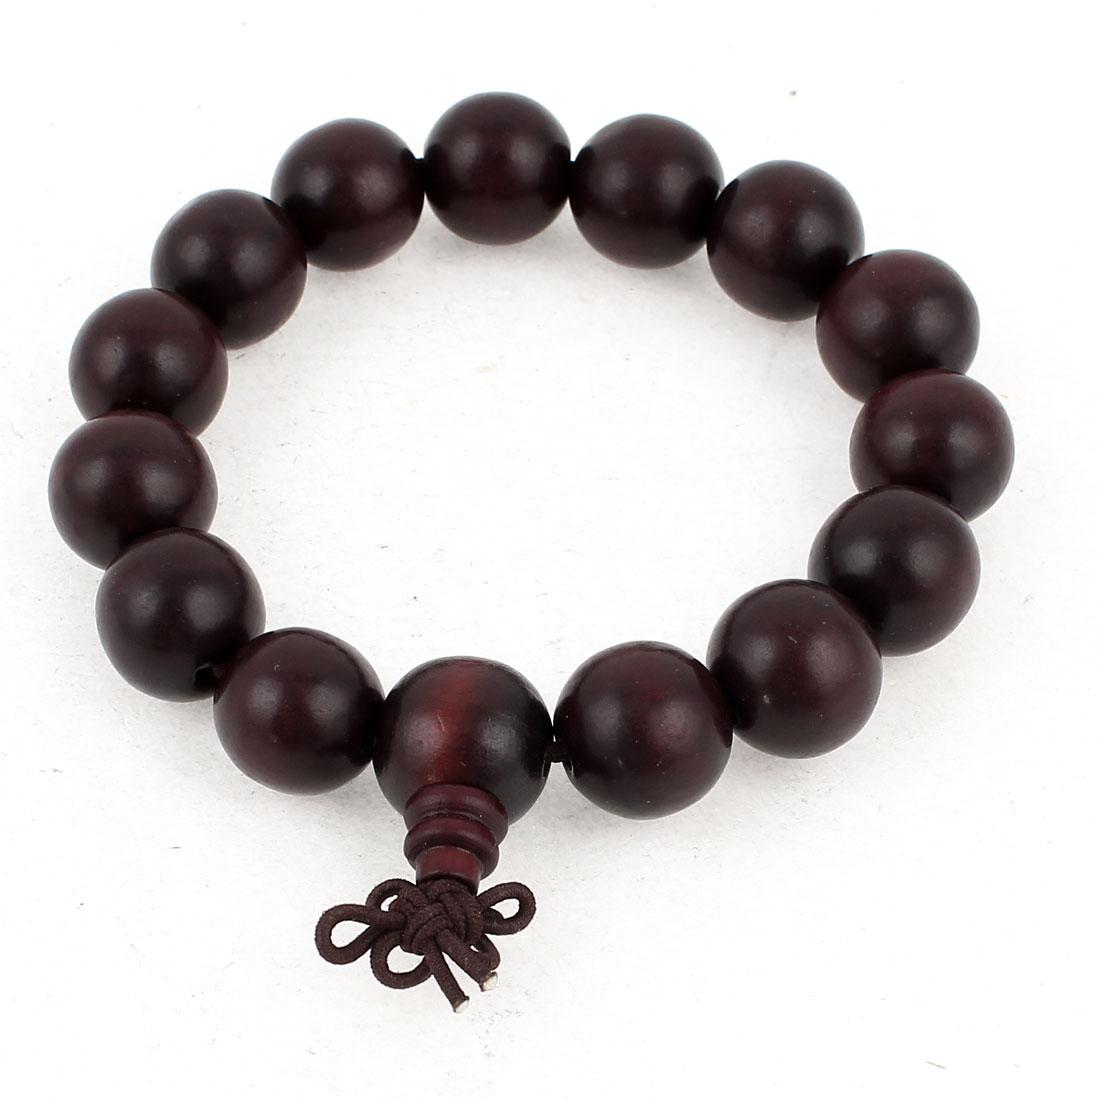 26cm Girth Wood Dark Brown Round Bead Elastic Bracelet for Unisex